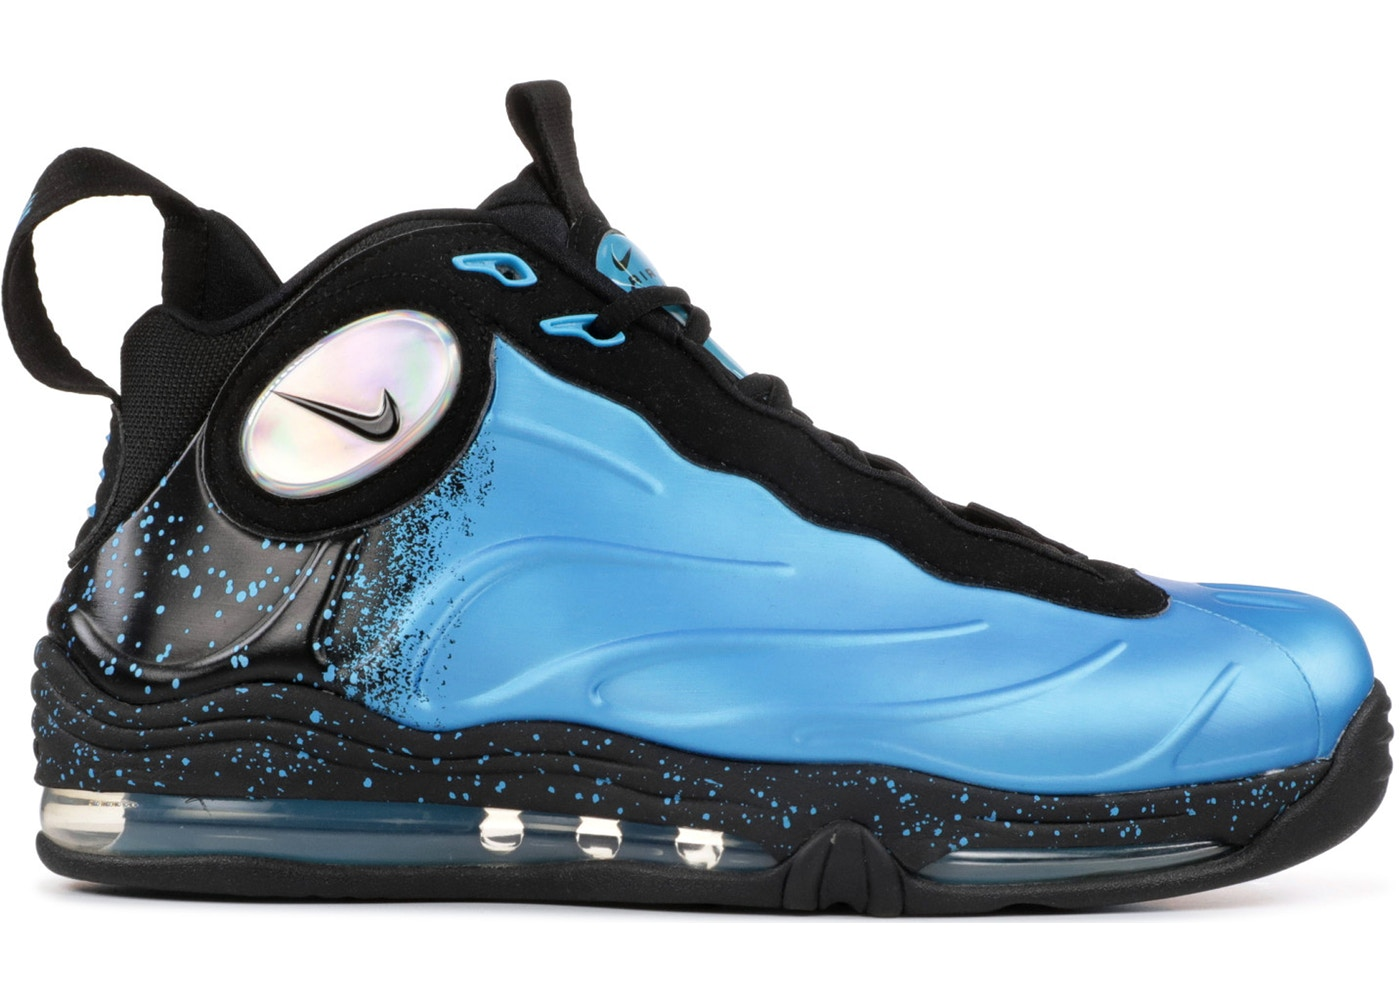 64670d30b41 Nike Total Air Foamposite Max Current Blue - 472498-400